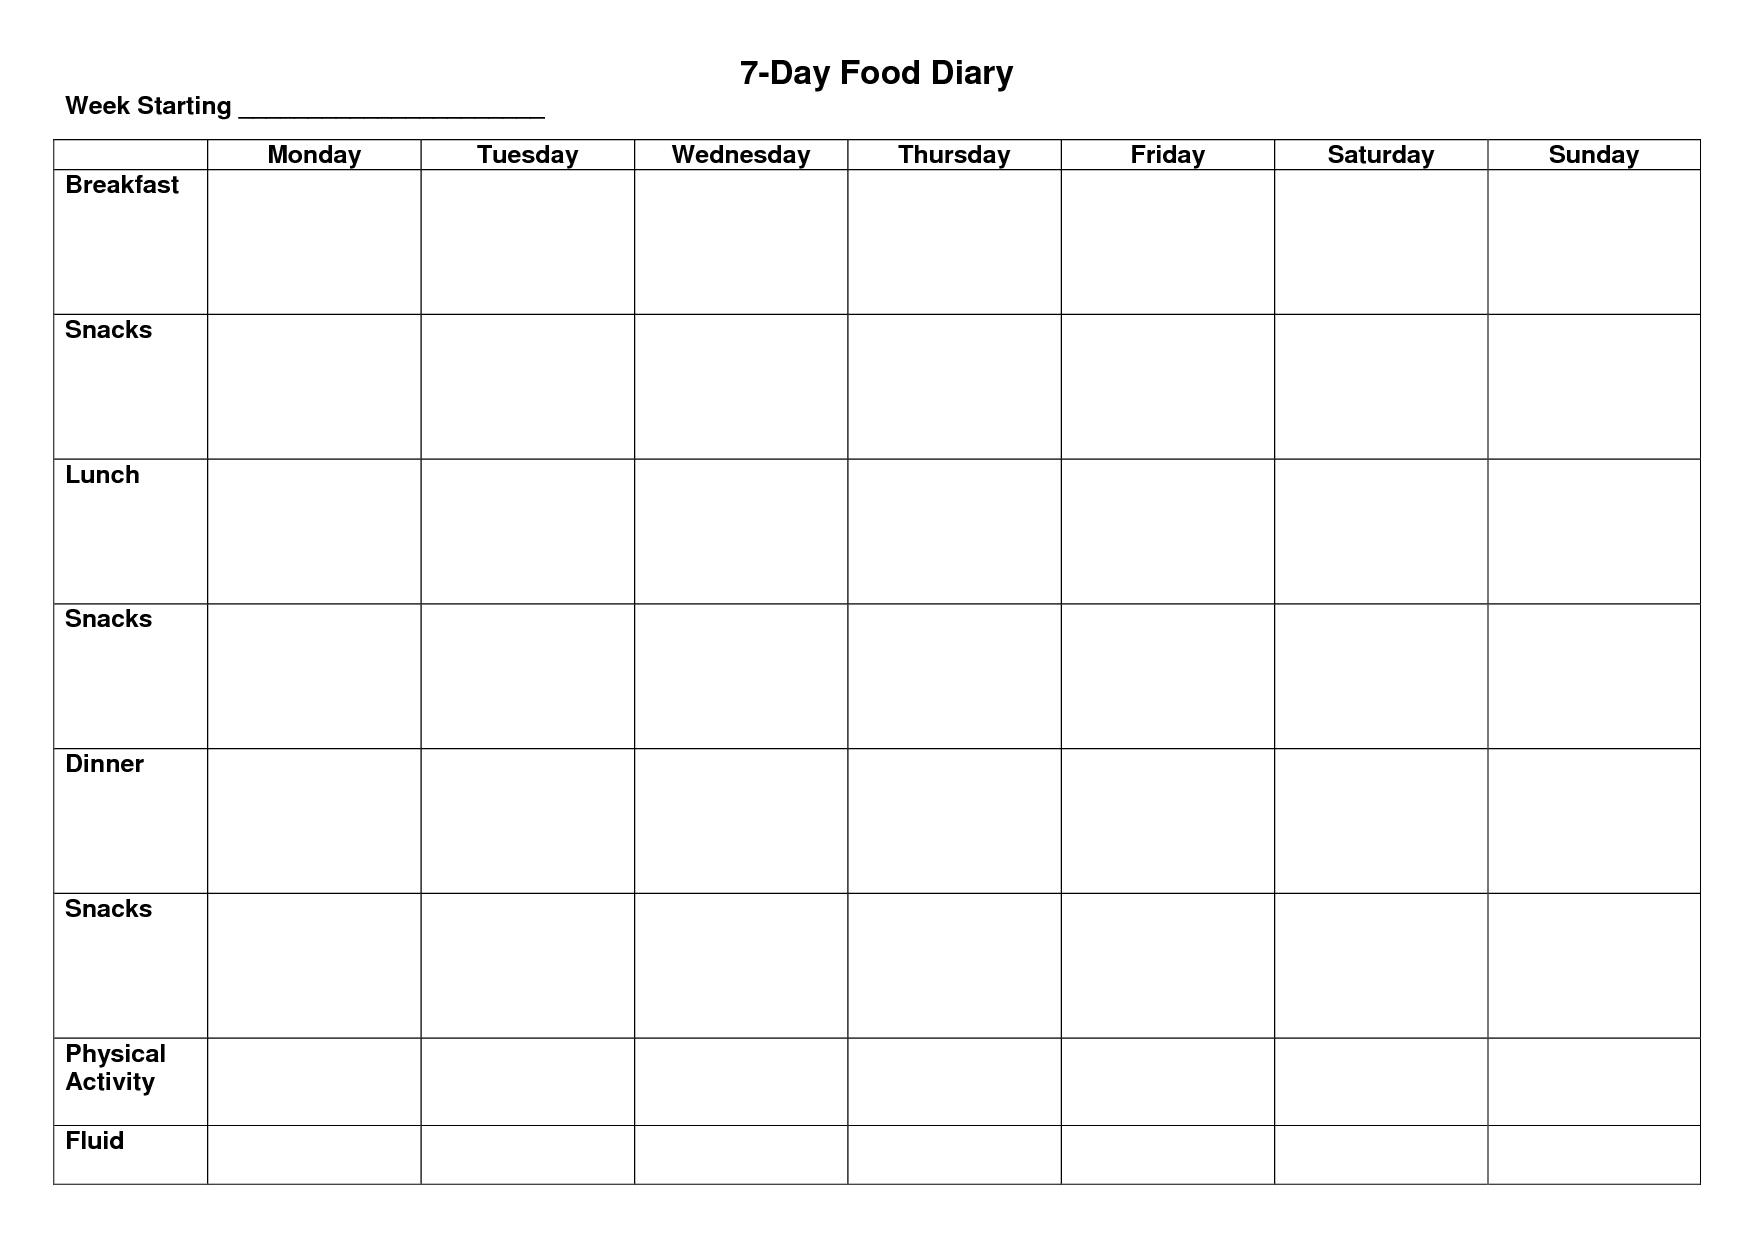 7-Day Food Diary Template | Food Diary Template, Diary